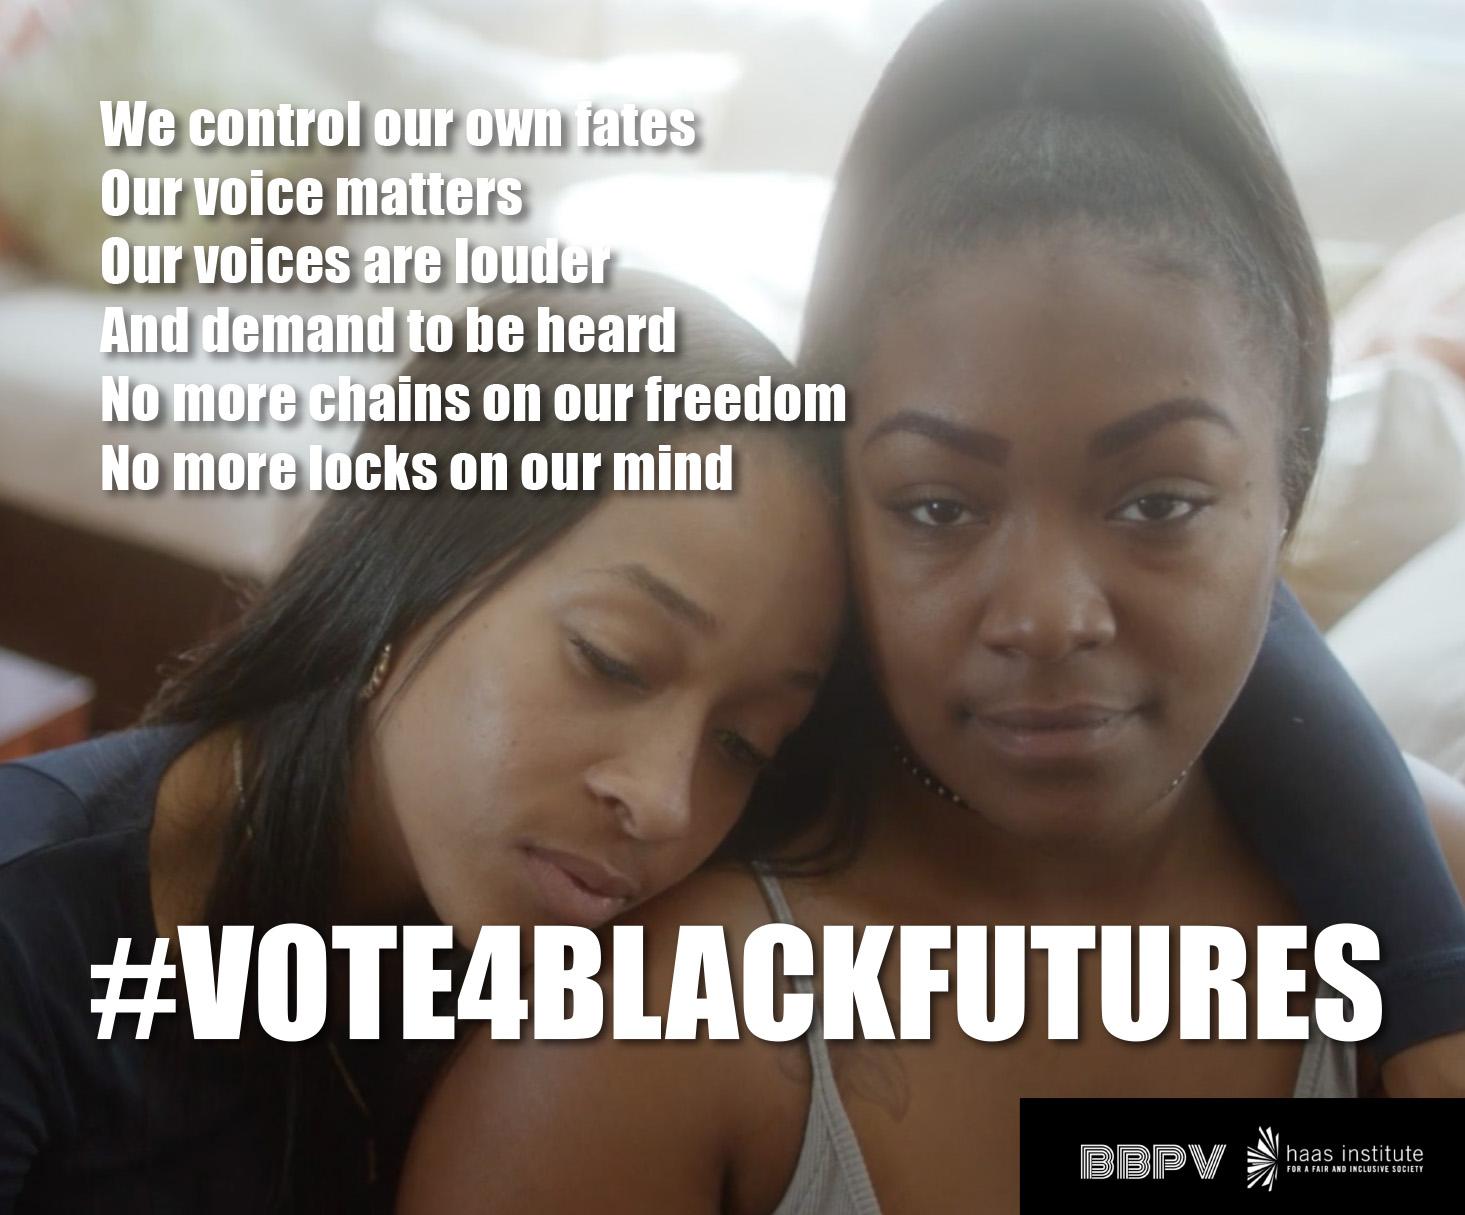 Vote4BlackFutures image